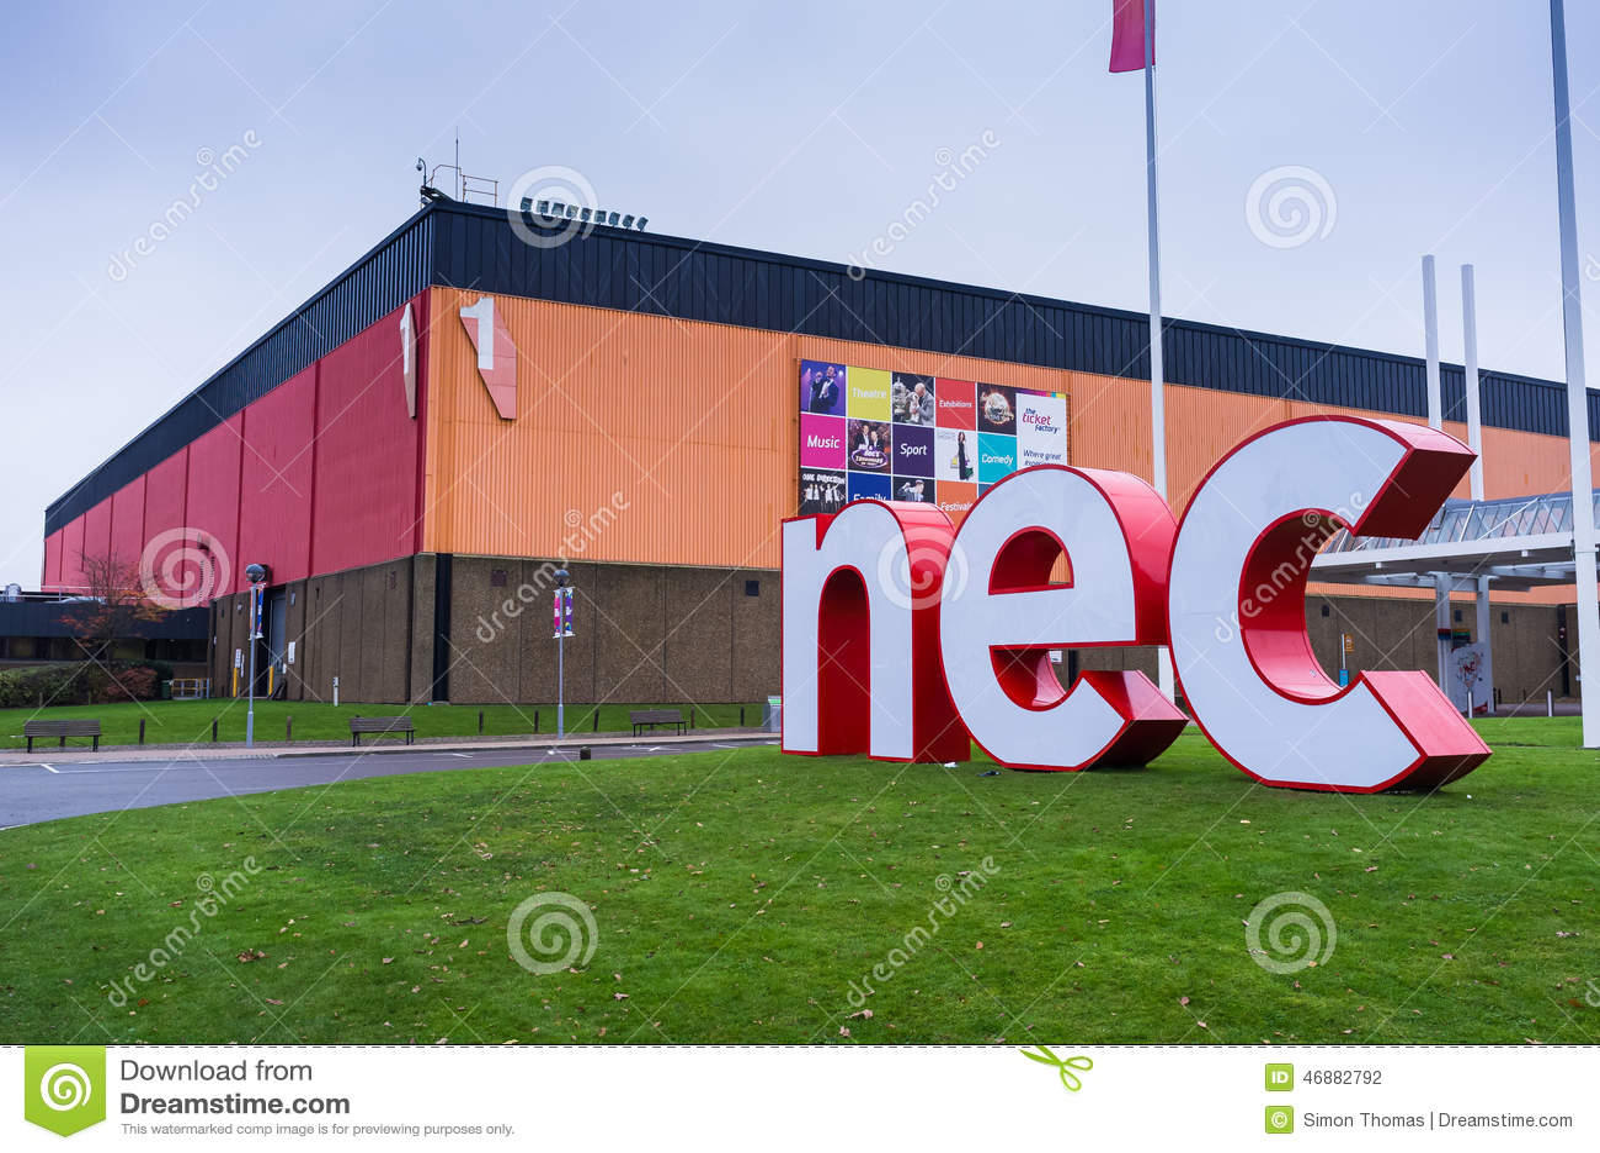 national exhibition centre editorial photography image of nationalnational exhibition centre